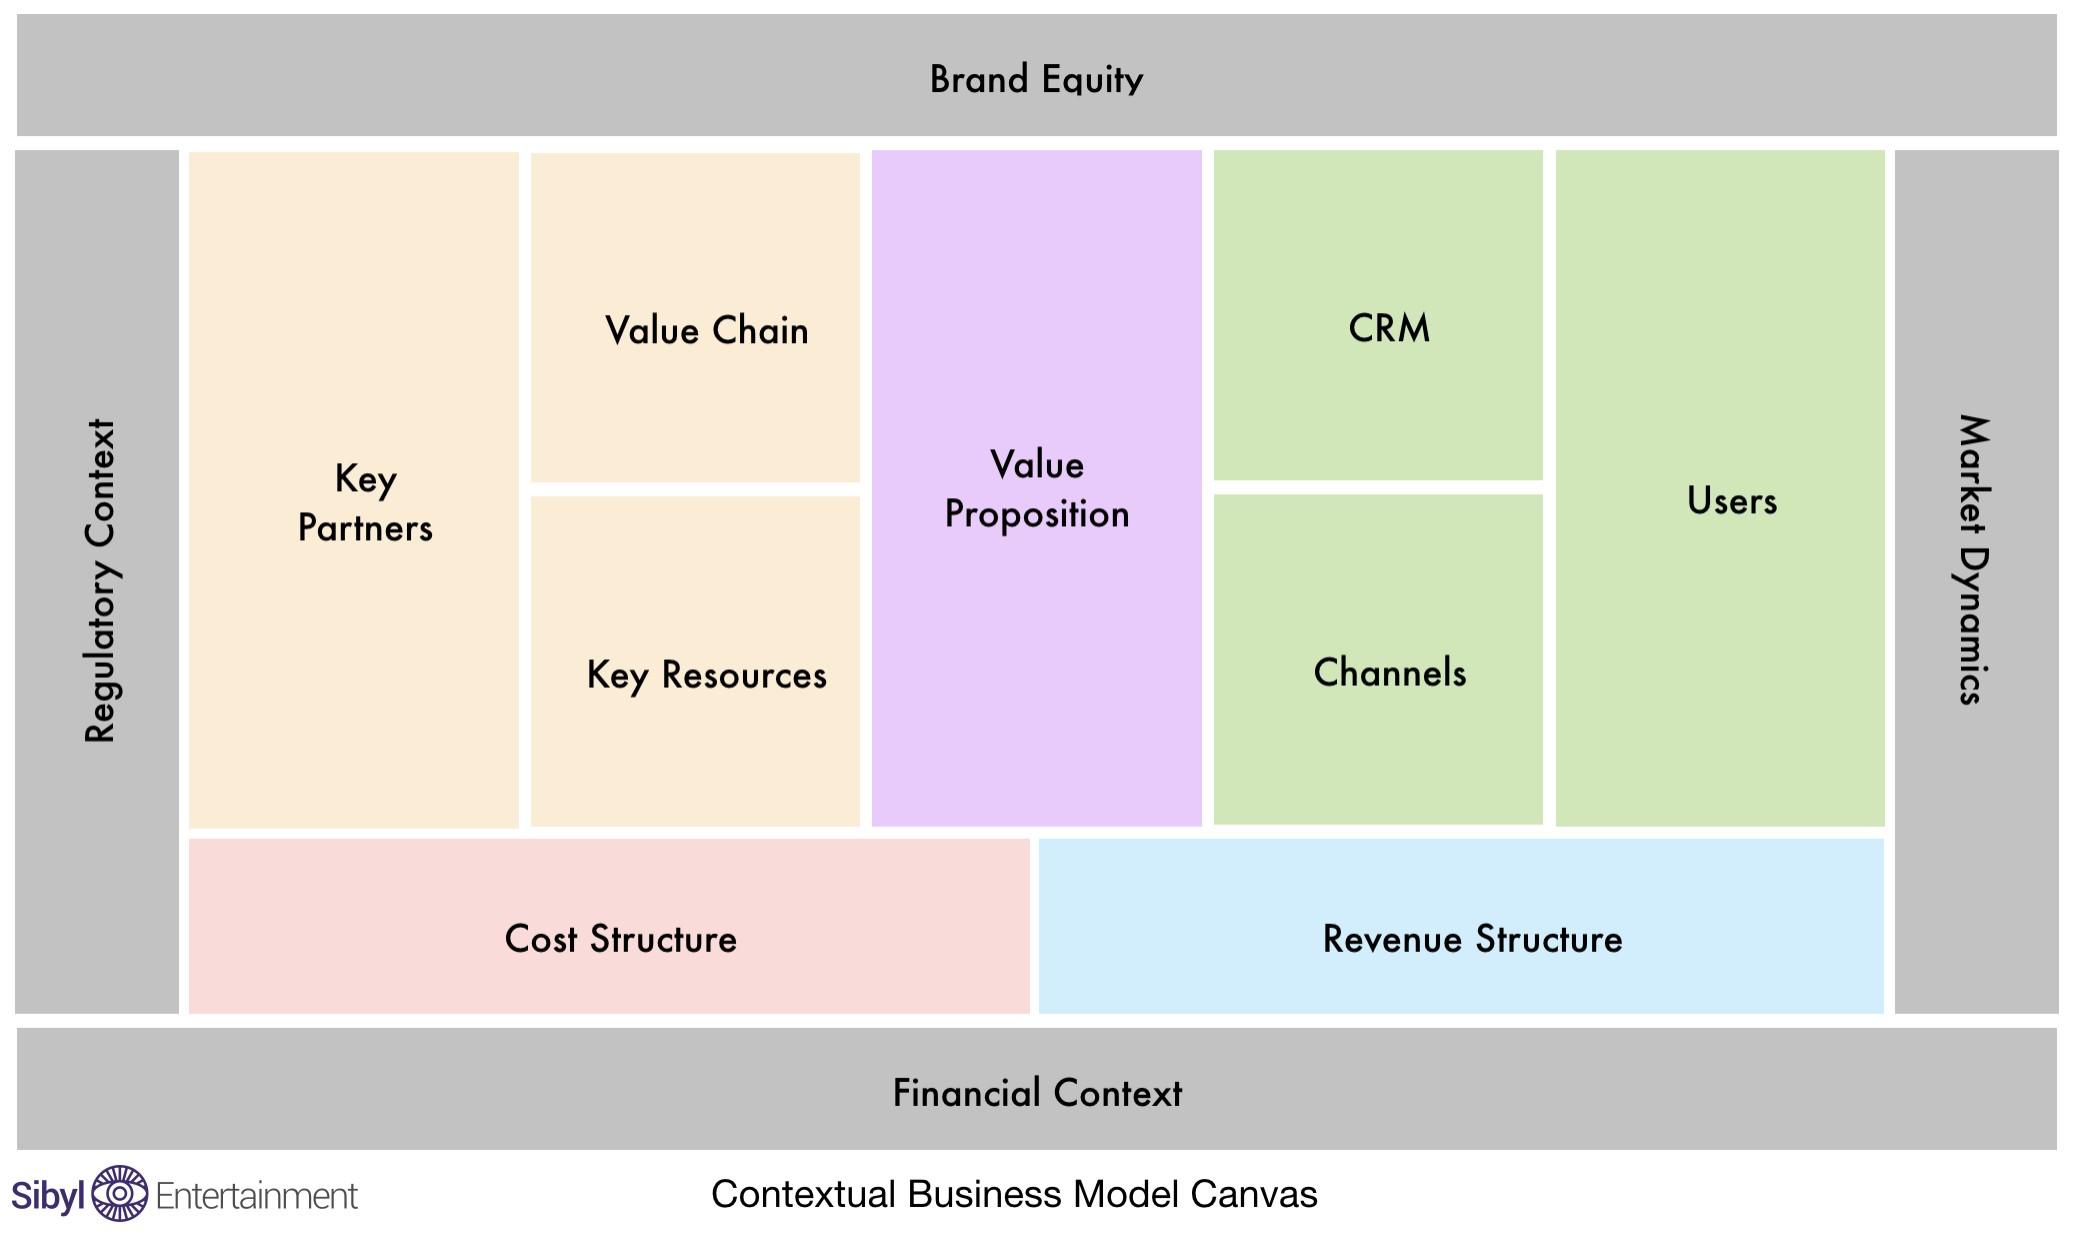 Contextual Business Model Canvas